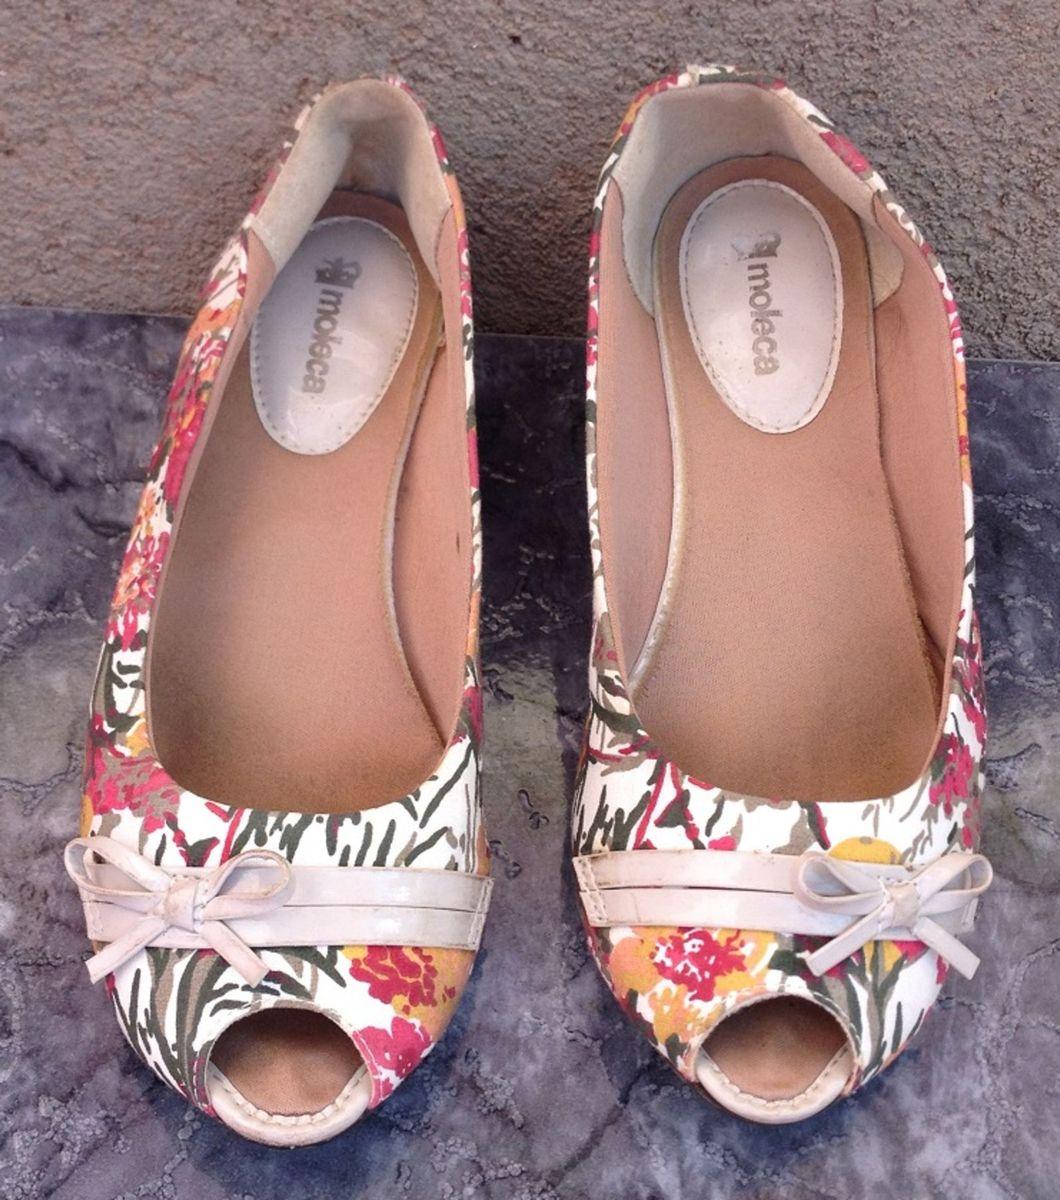 3b00029b75 sapatilha moleca estampada (peep toe) - sapatilha moleca